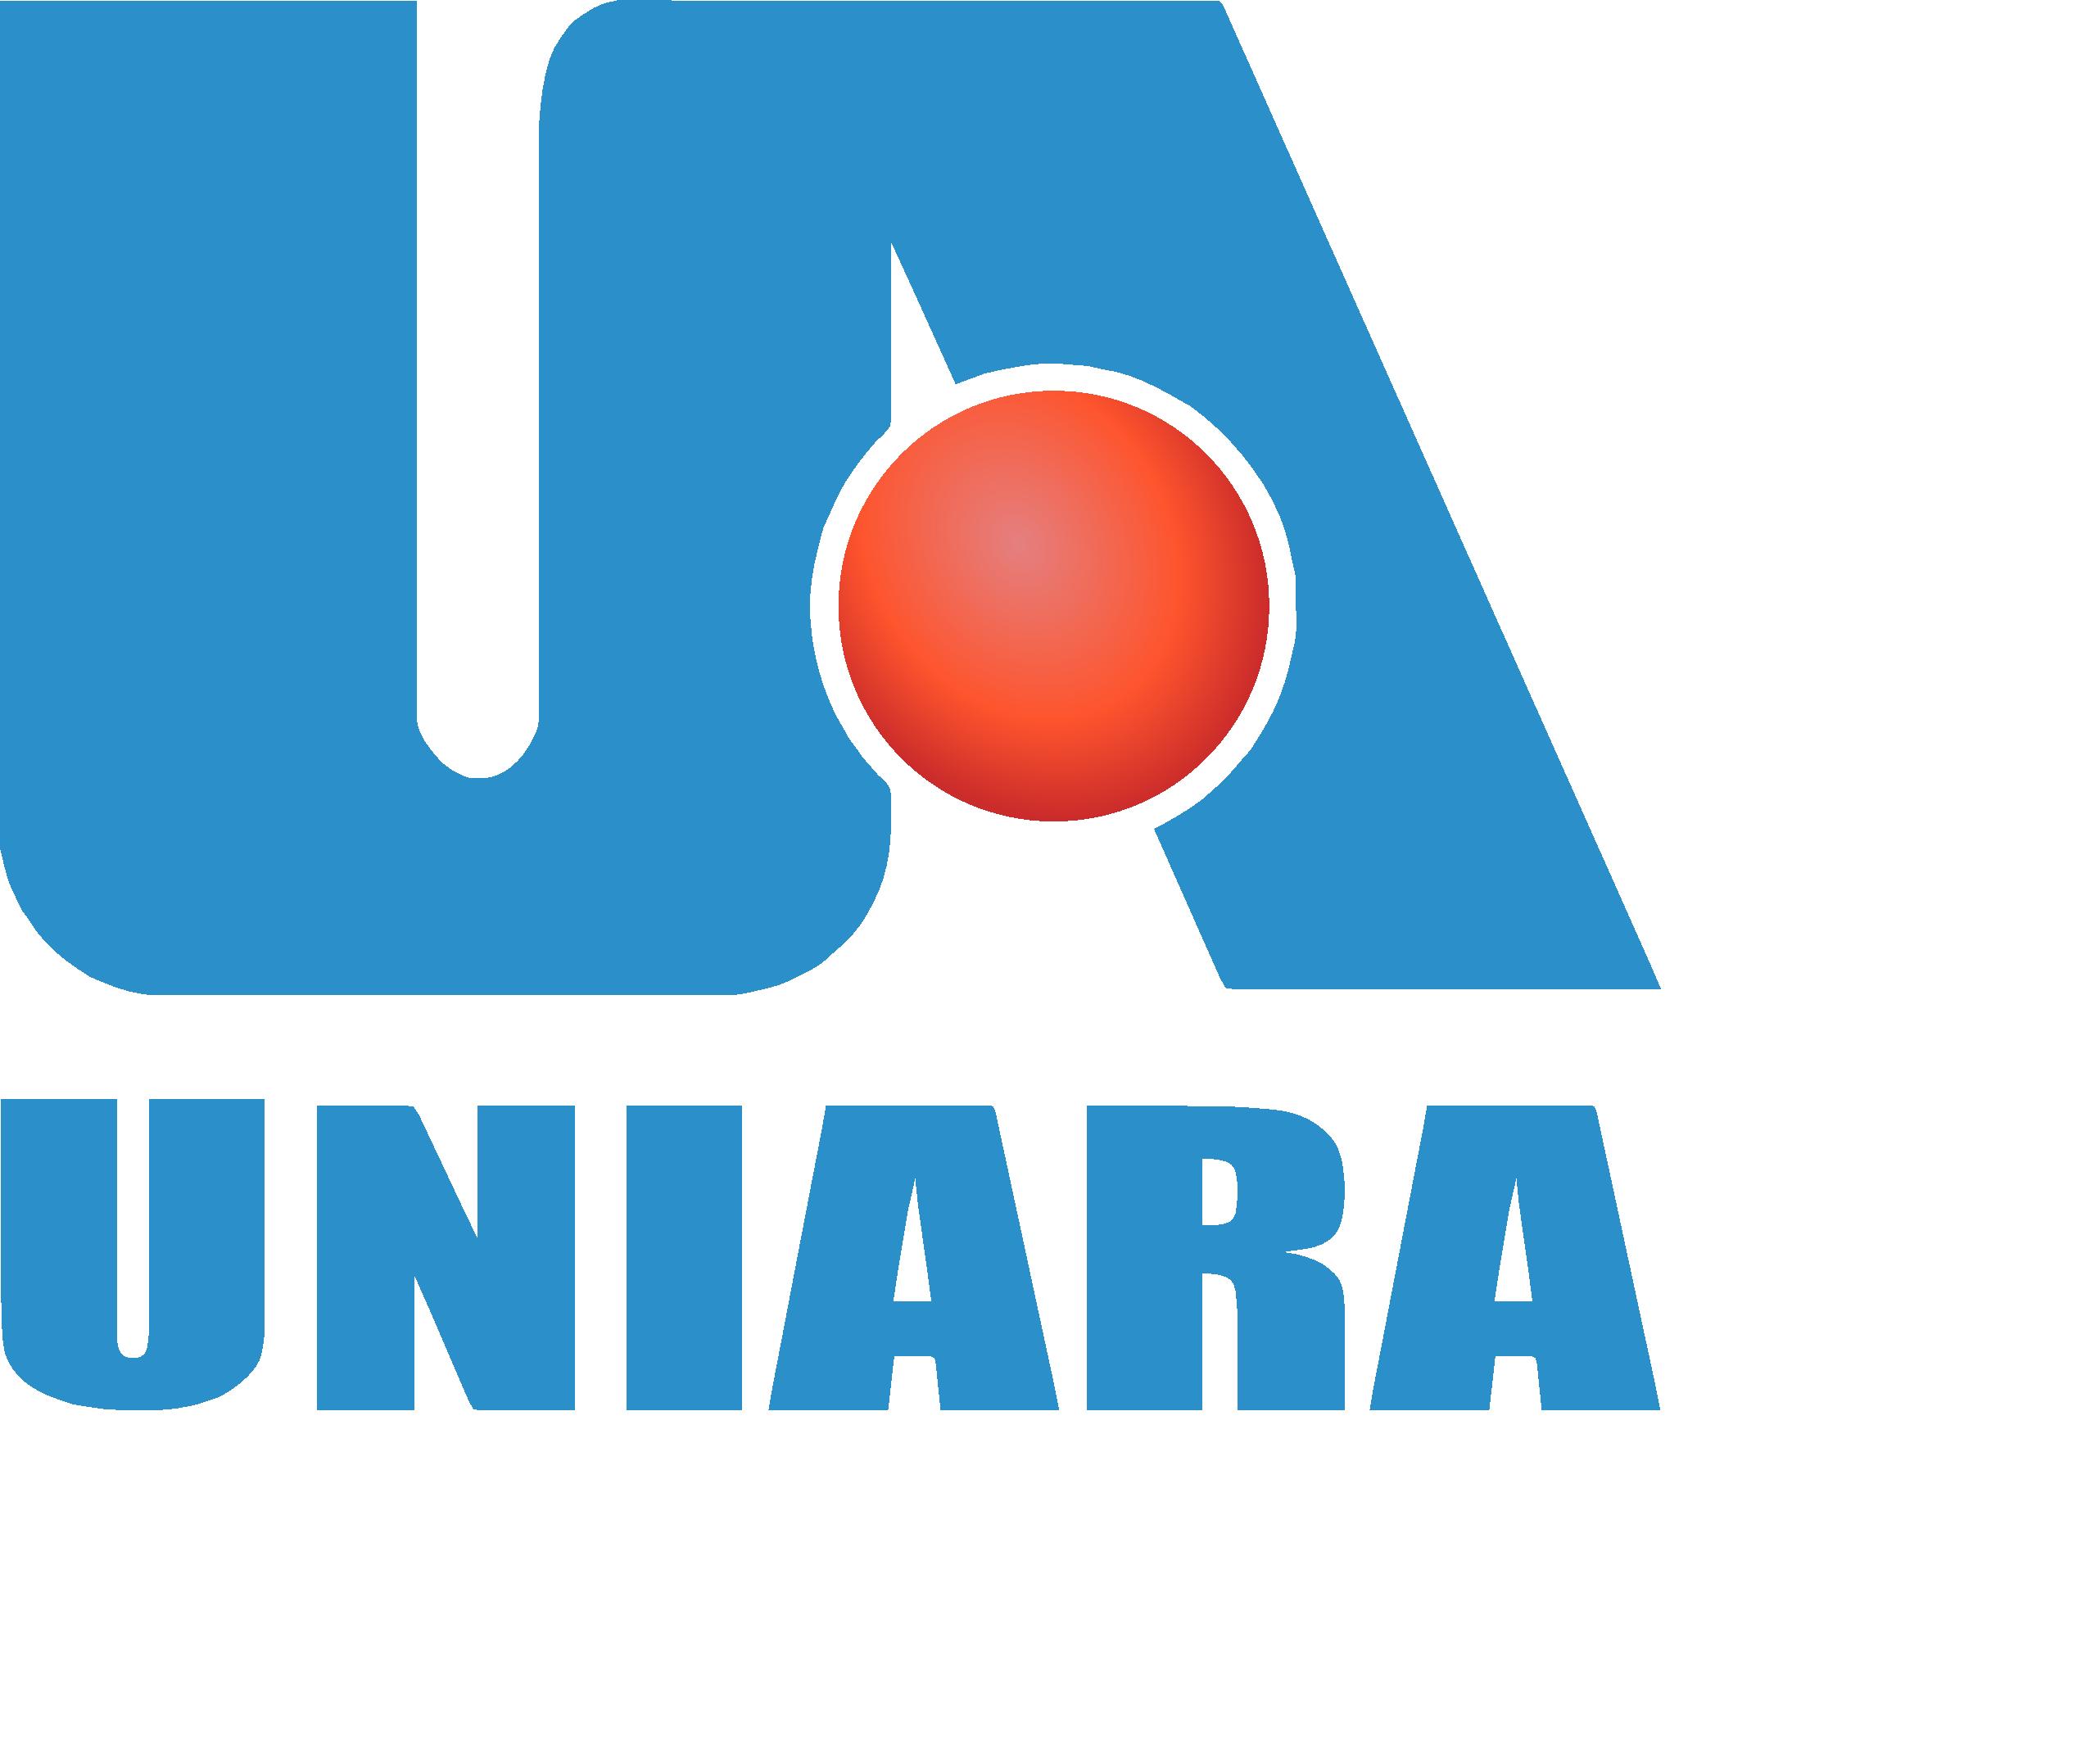 UNIARA